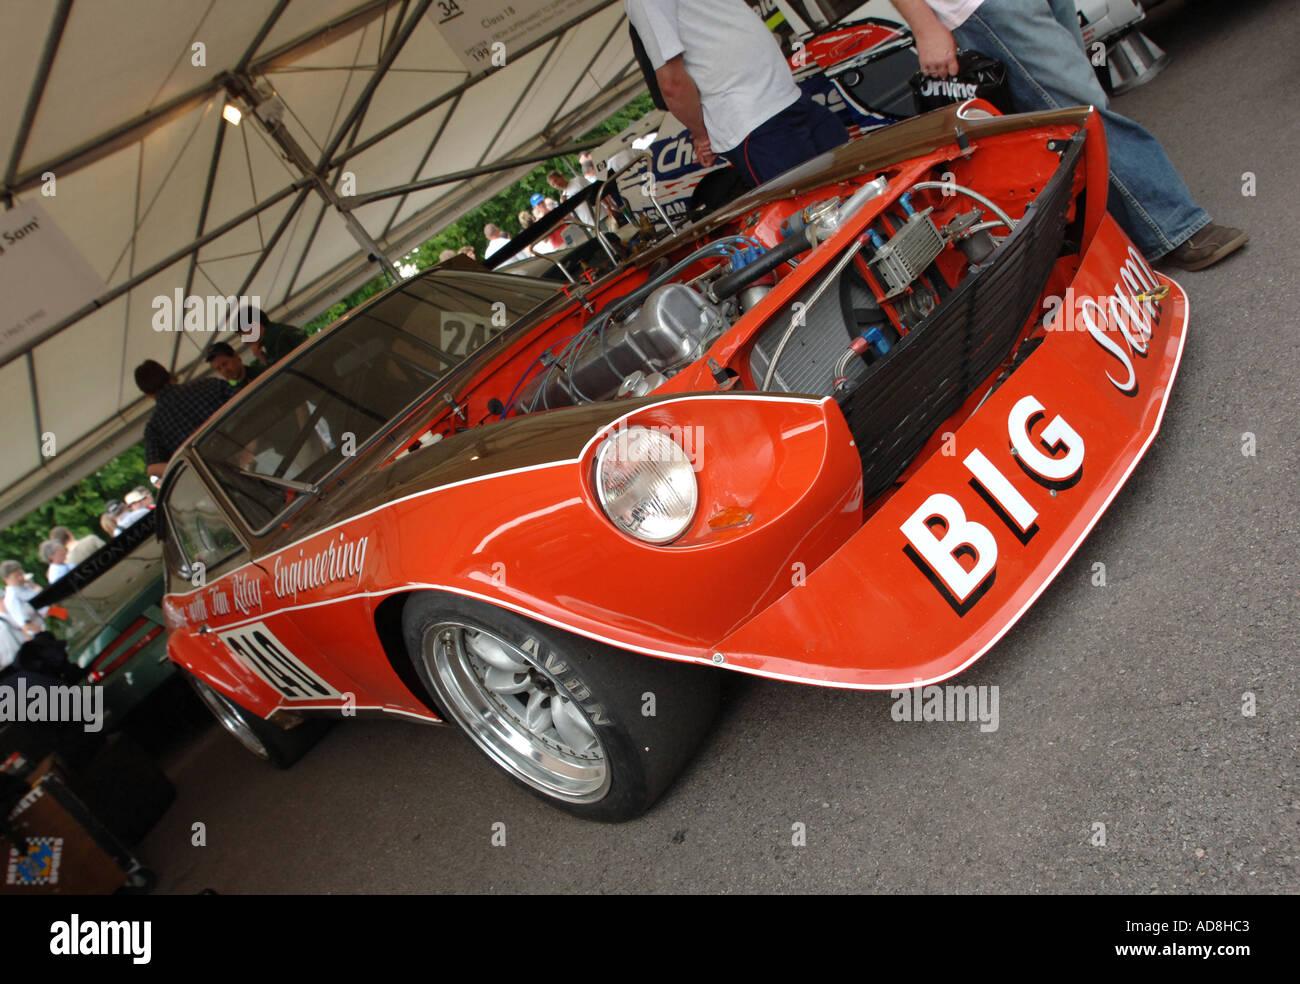 Datsun 240z stock photos datsun 240z stock images alamy 1974 datsun 240z big sam at goodwood festival of speed 2005 stock image vanachro Gallery